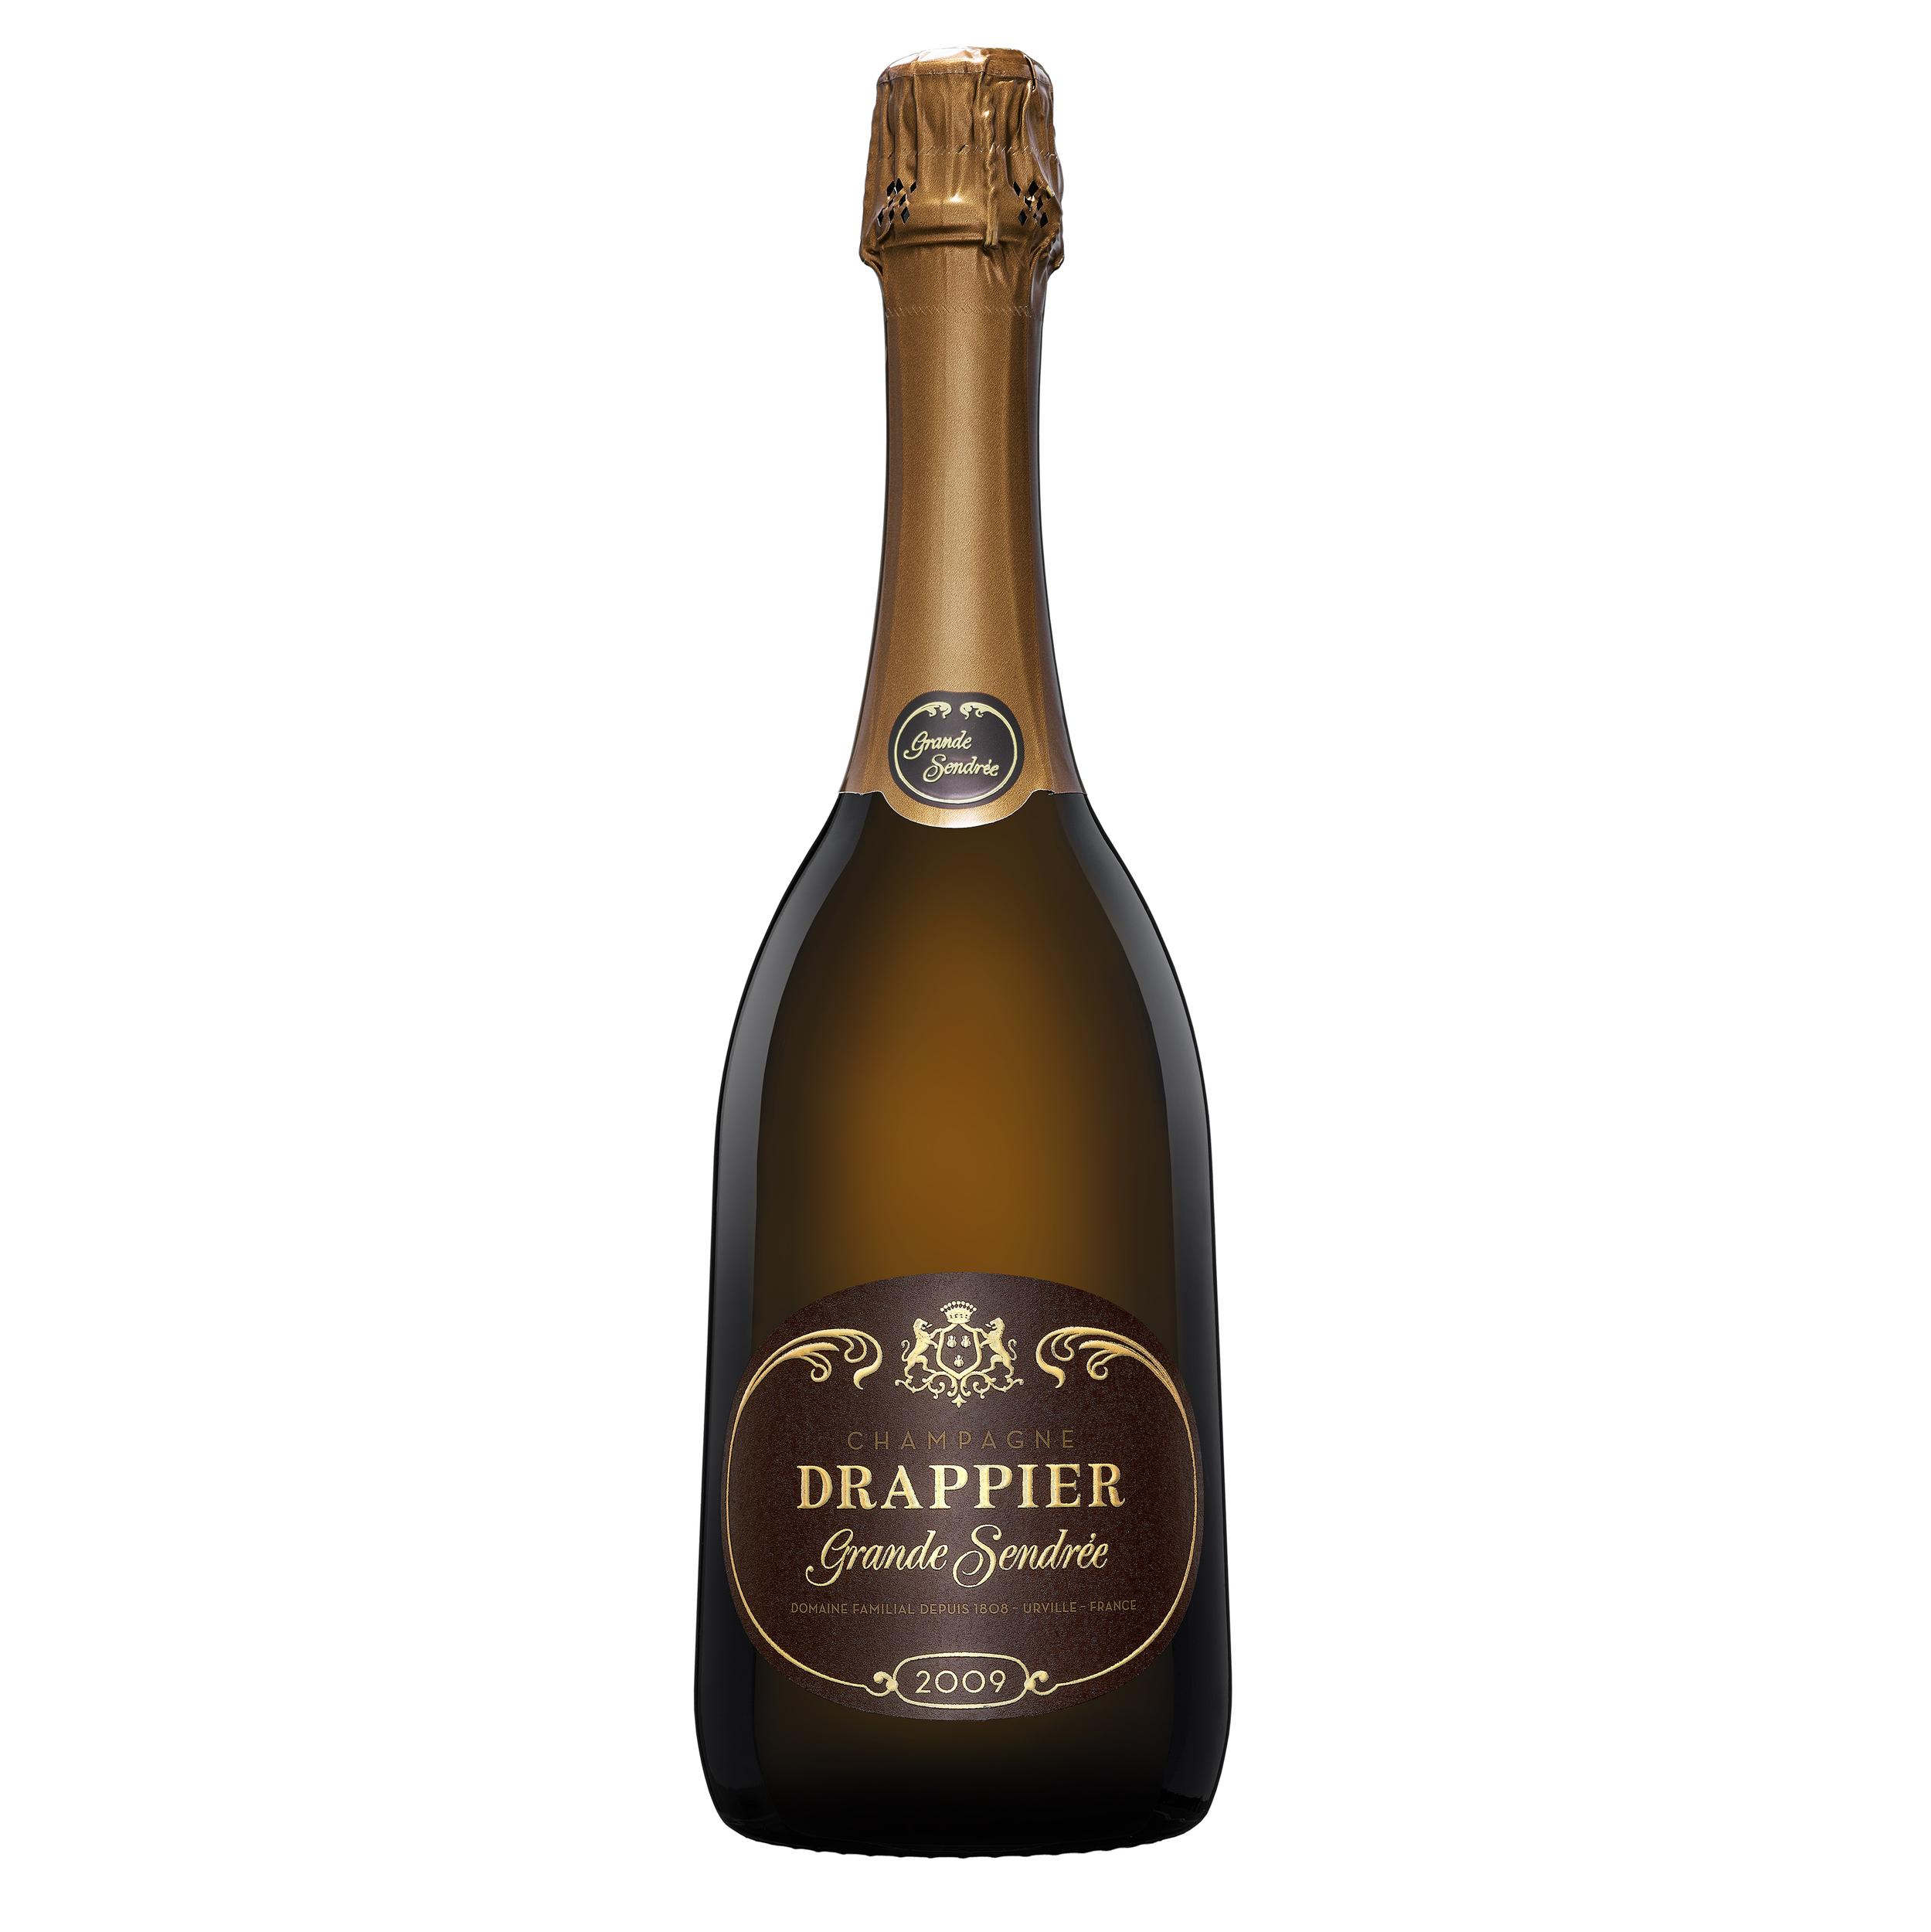 Grande Sendrée - Champagne Drappier - 2009